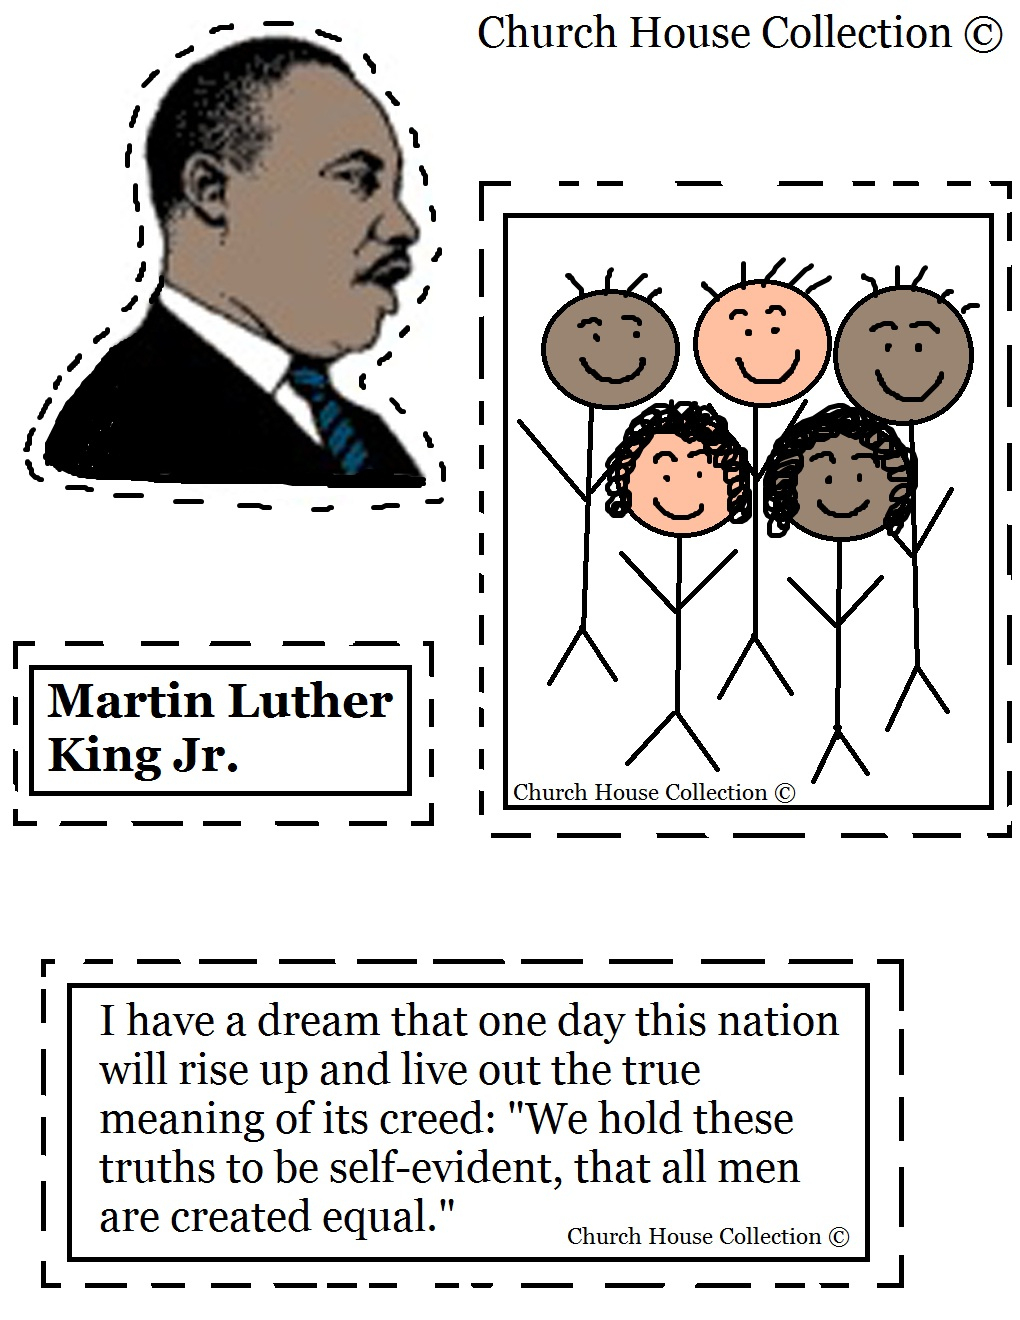 Coloring Pages ~ Free Printable Coloringes Of Martin Luther King Jr - Free Printable Martin Luther King Jr Worksheets For Kindergarten